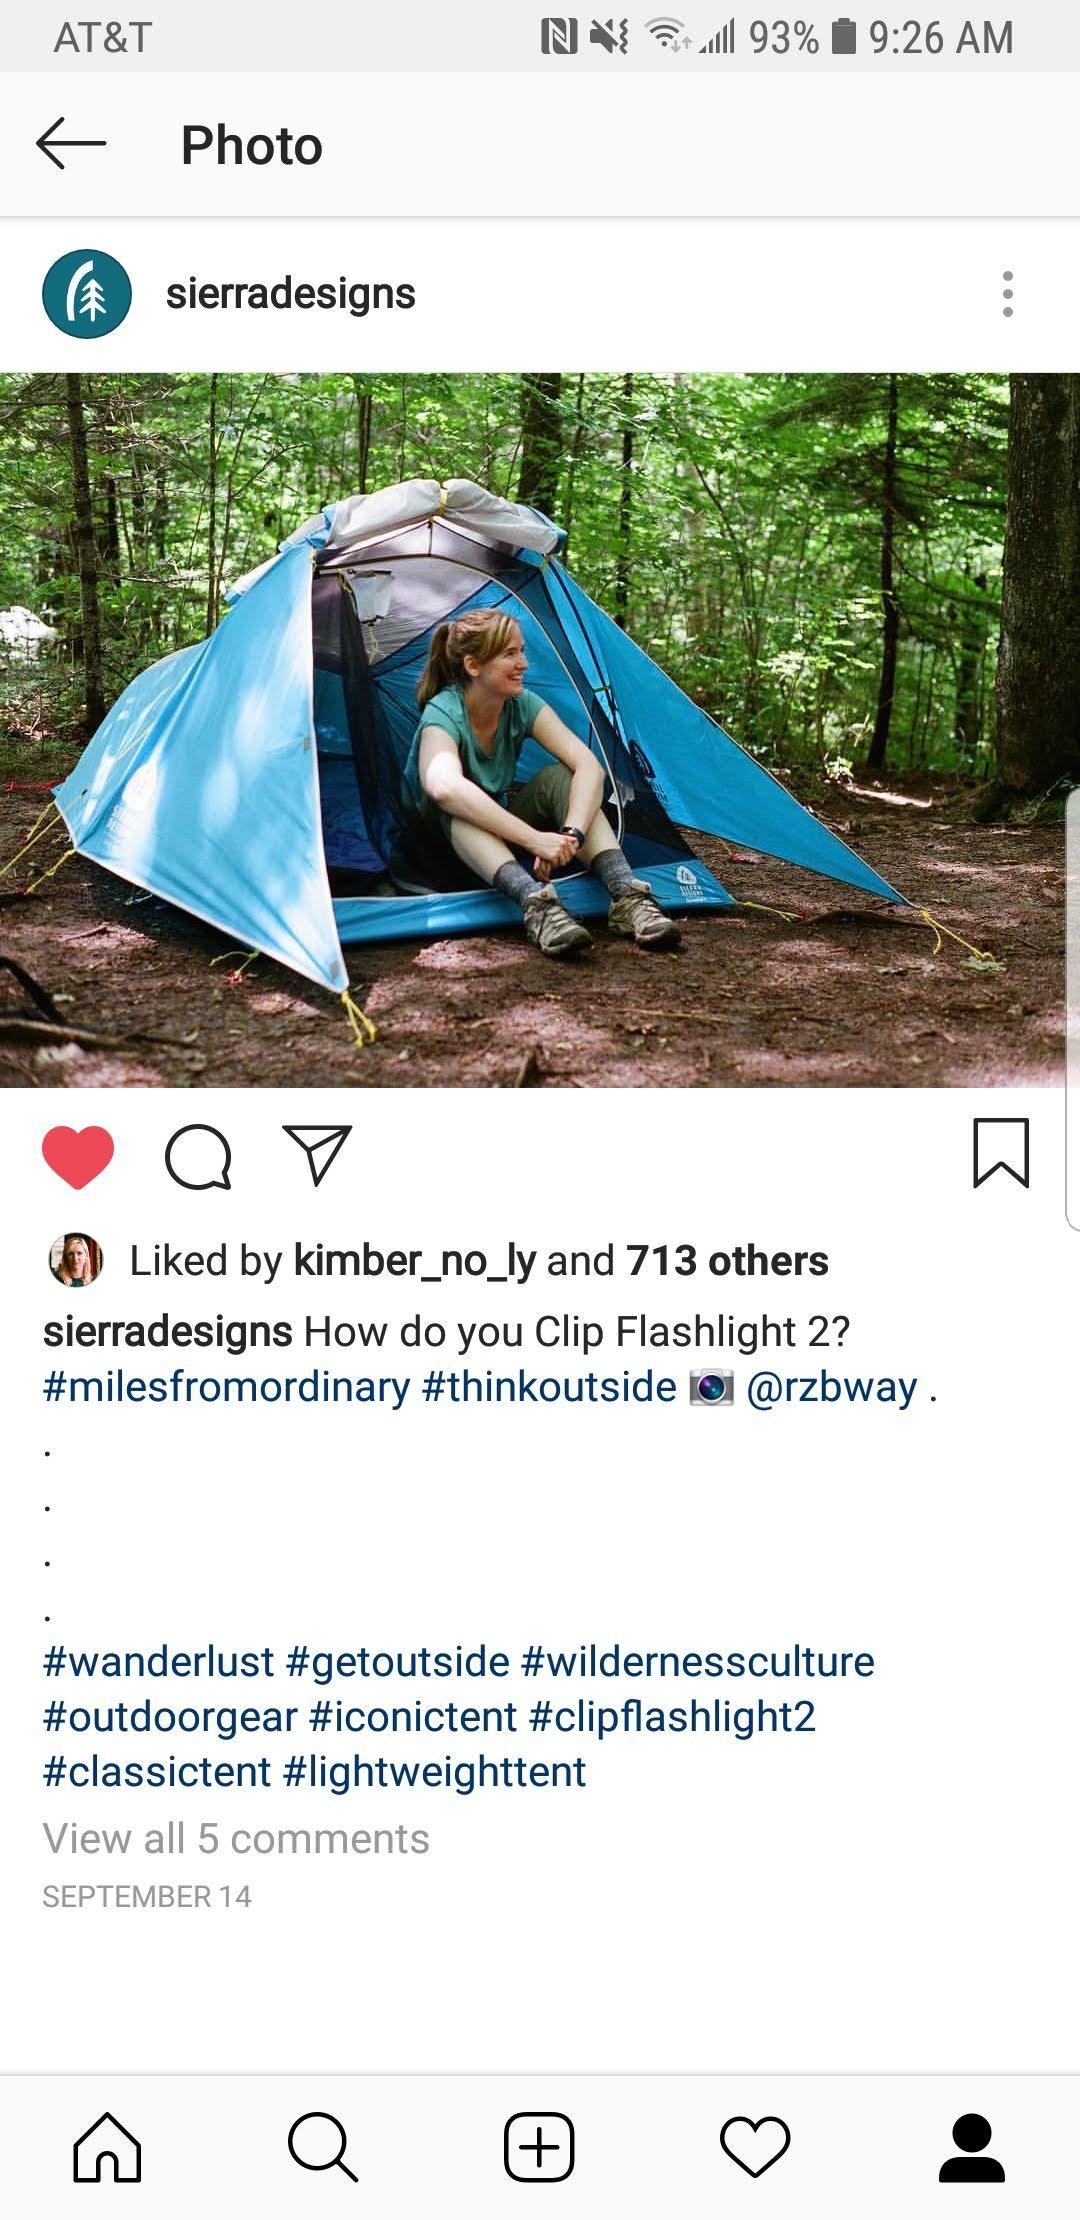 Screenshot_20181129-092658_Instagram.jpg